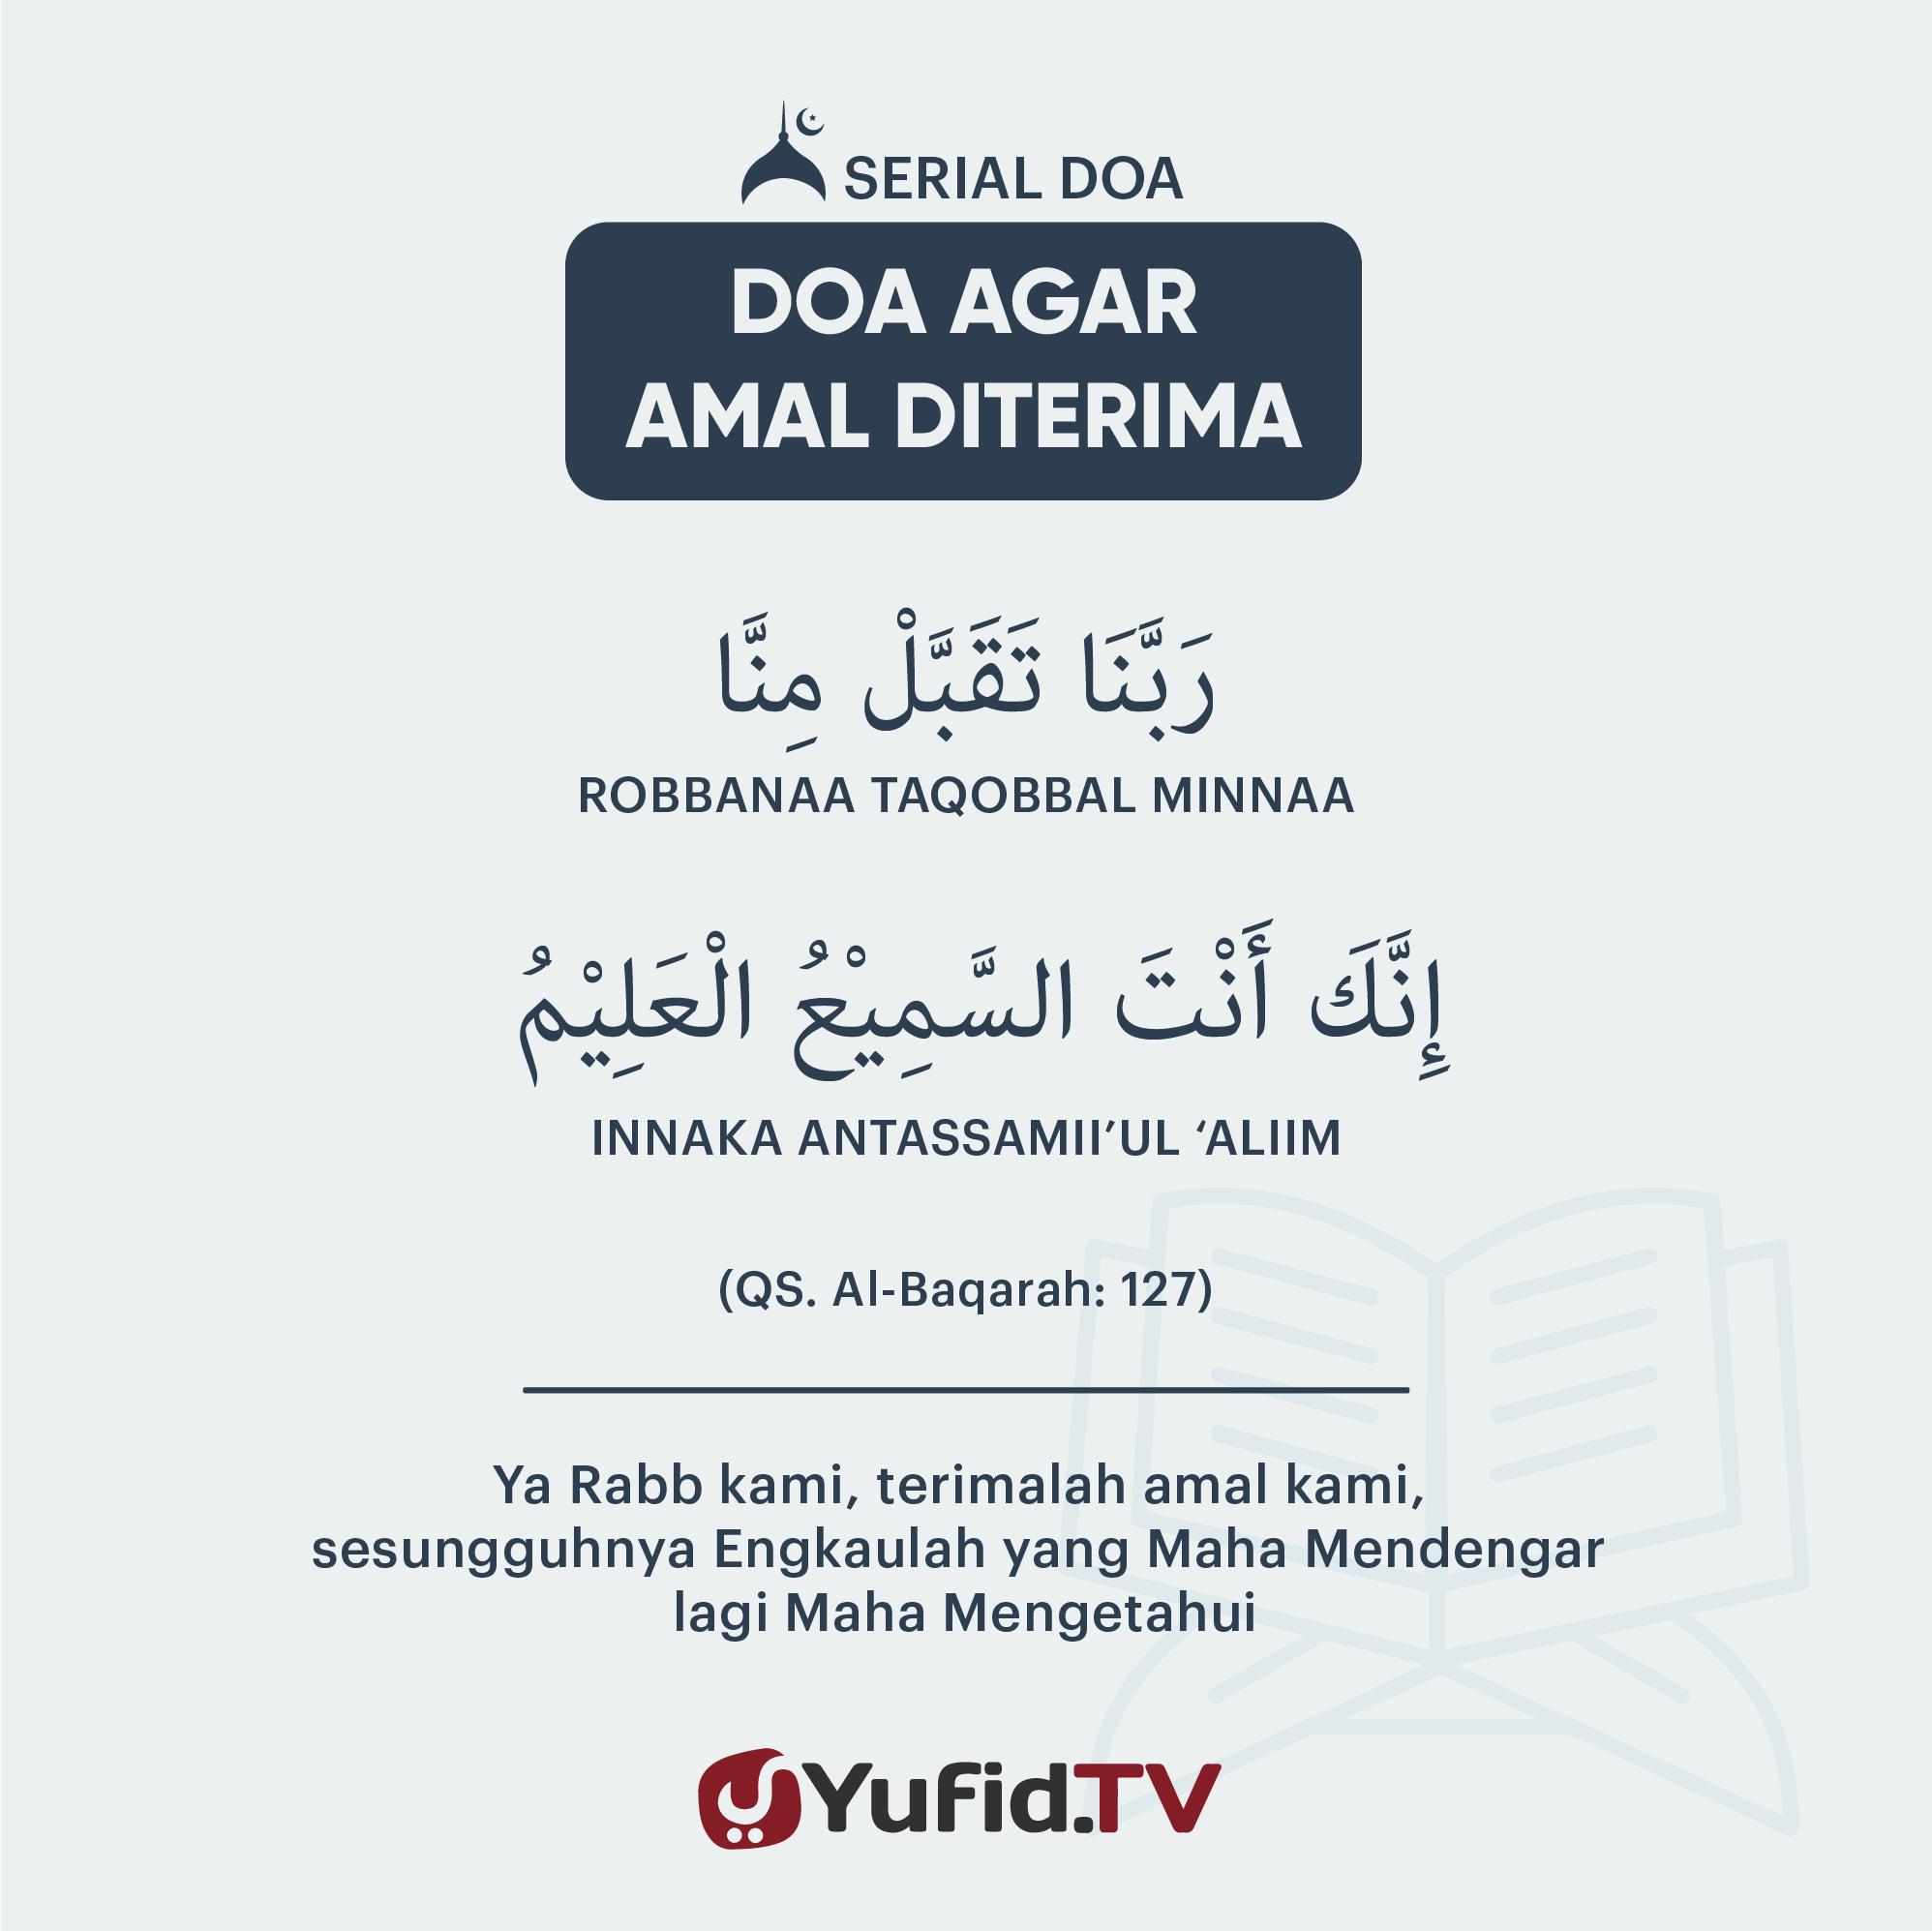 Doa Agar Amal Diterima